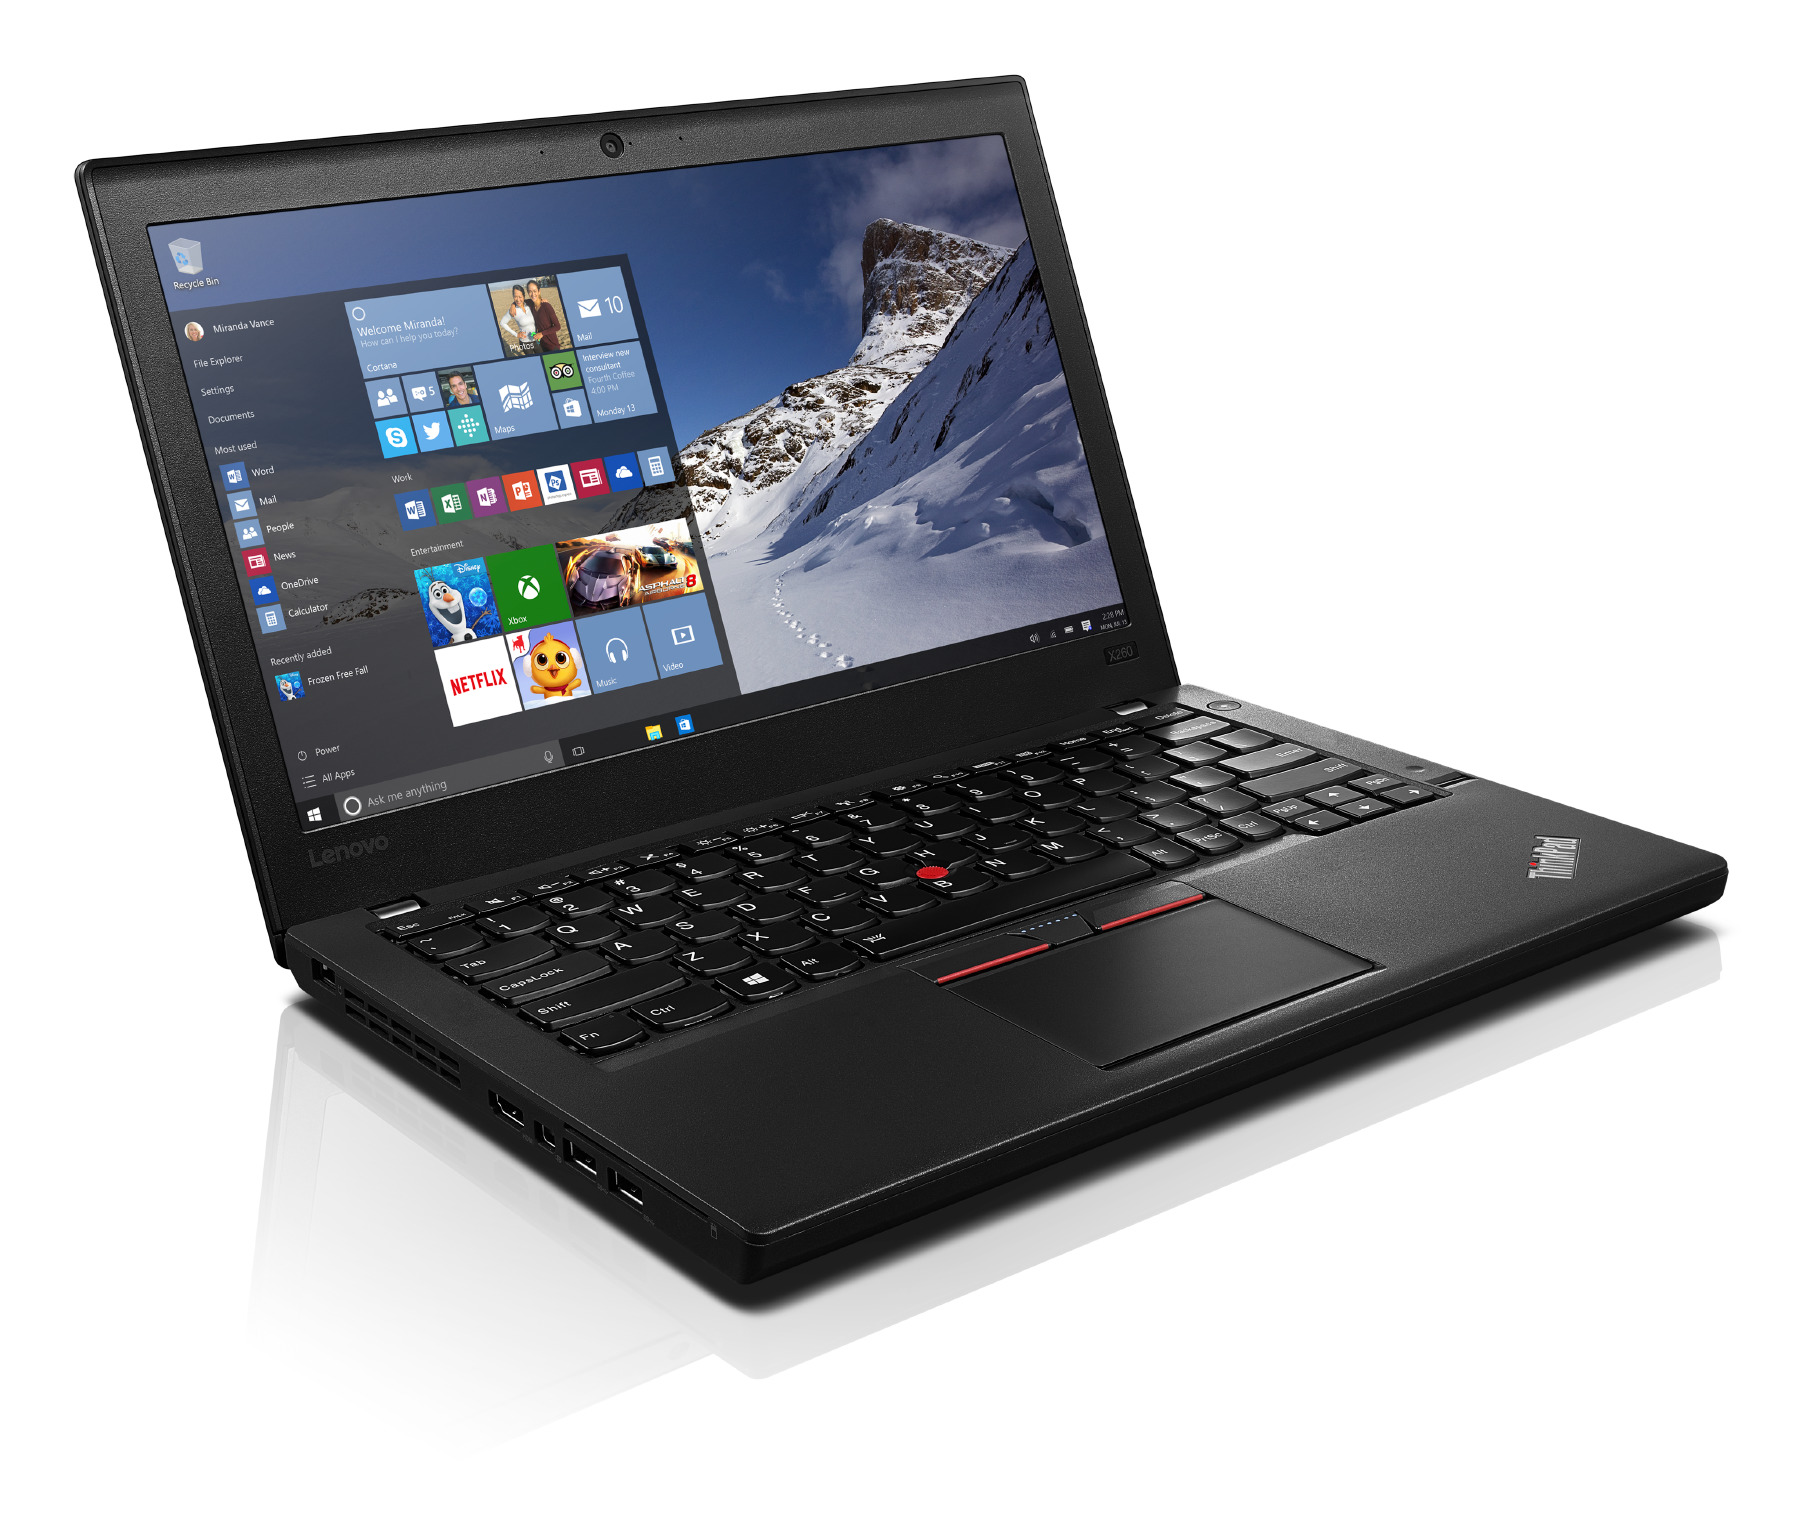 "Lenovo TP X260 12.5""FHD/i5-6300U/8G/180SSD/W10DG"